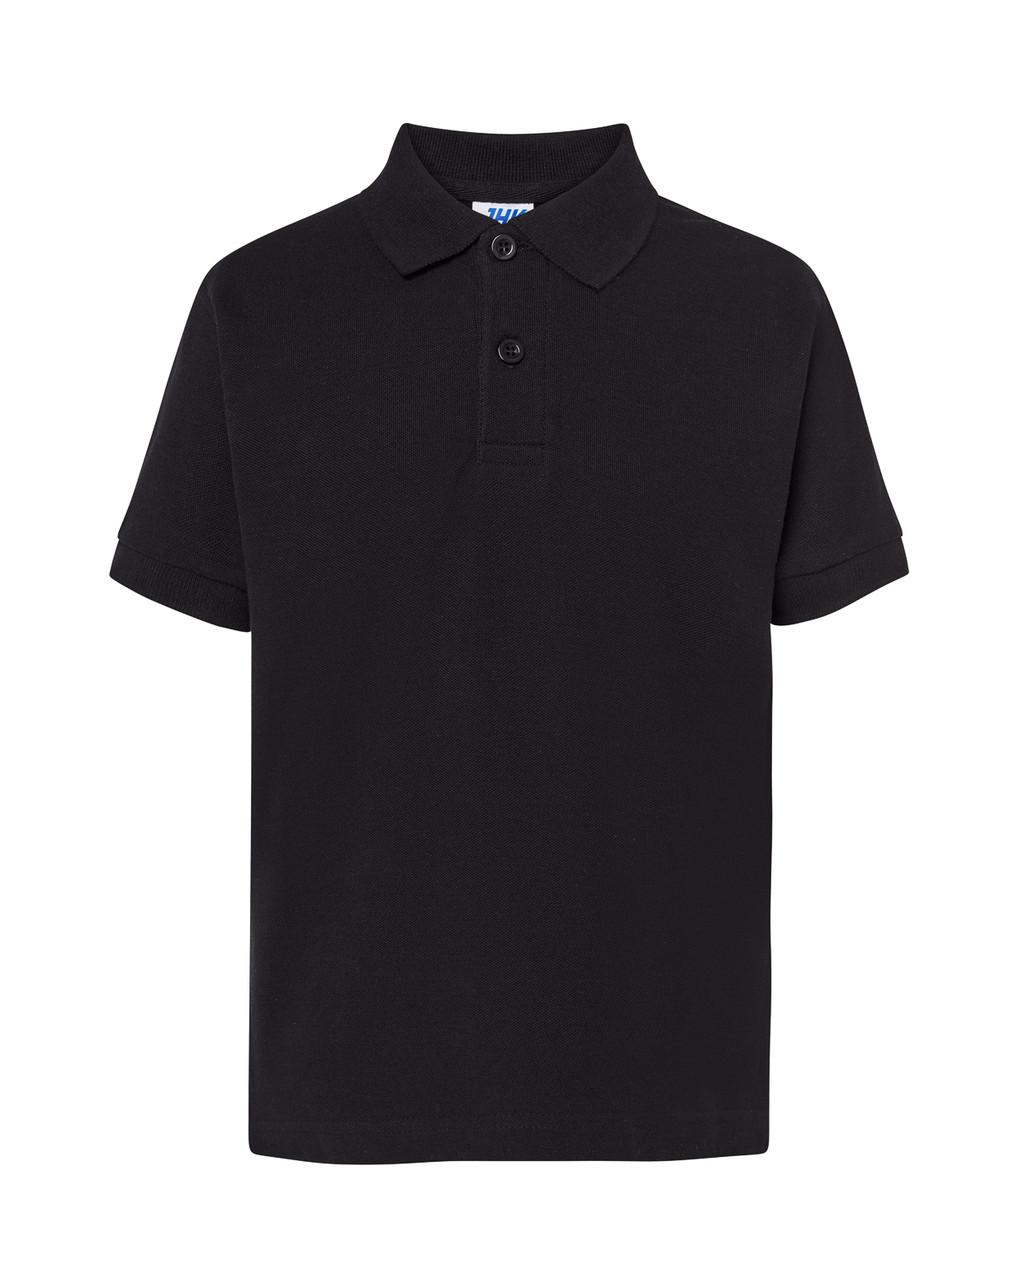 Детская футболка-поло JHK KID POLO цвет черный (BK)